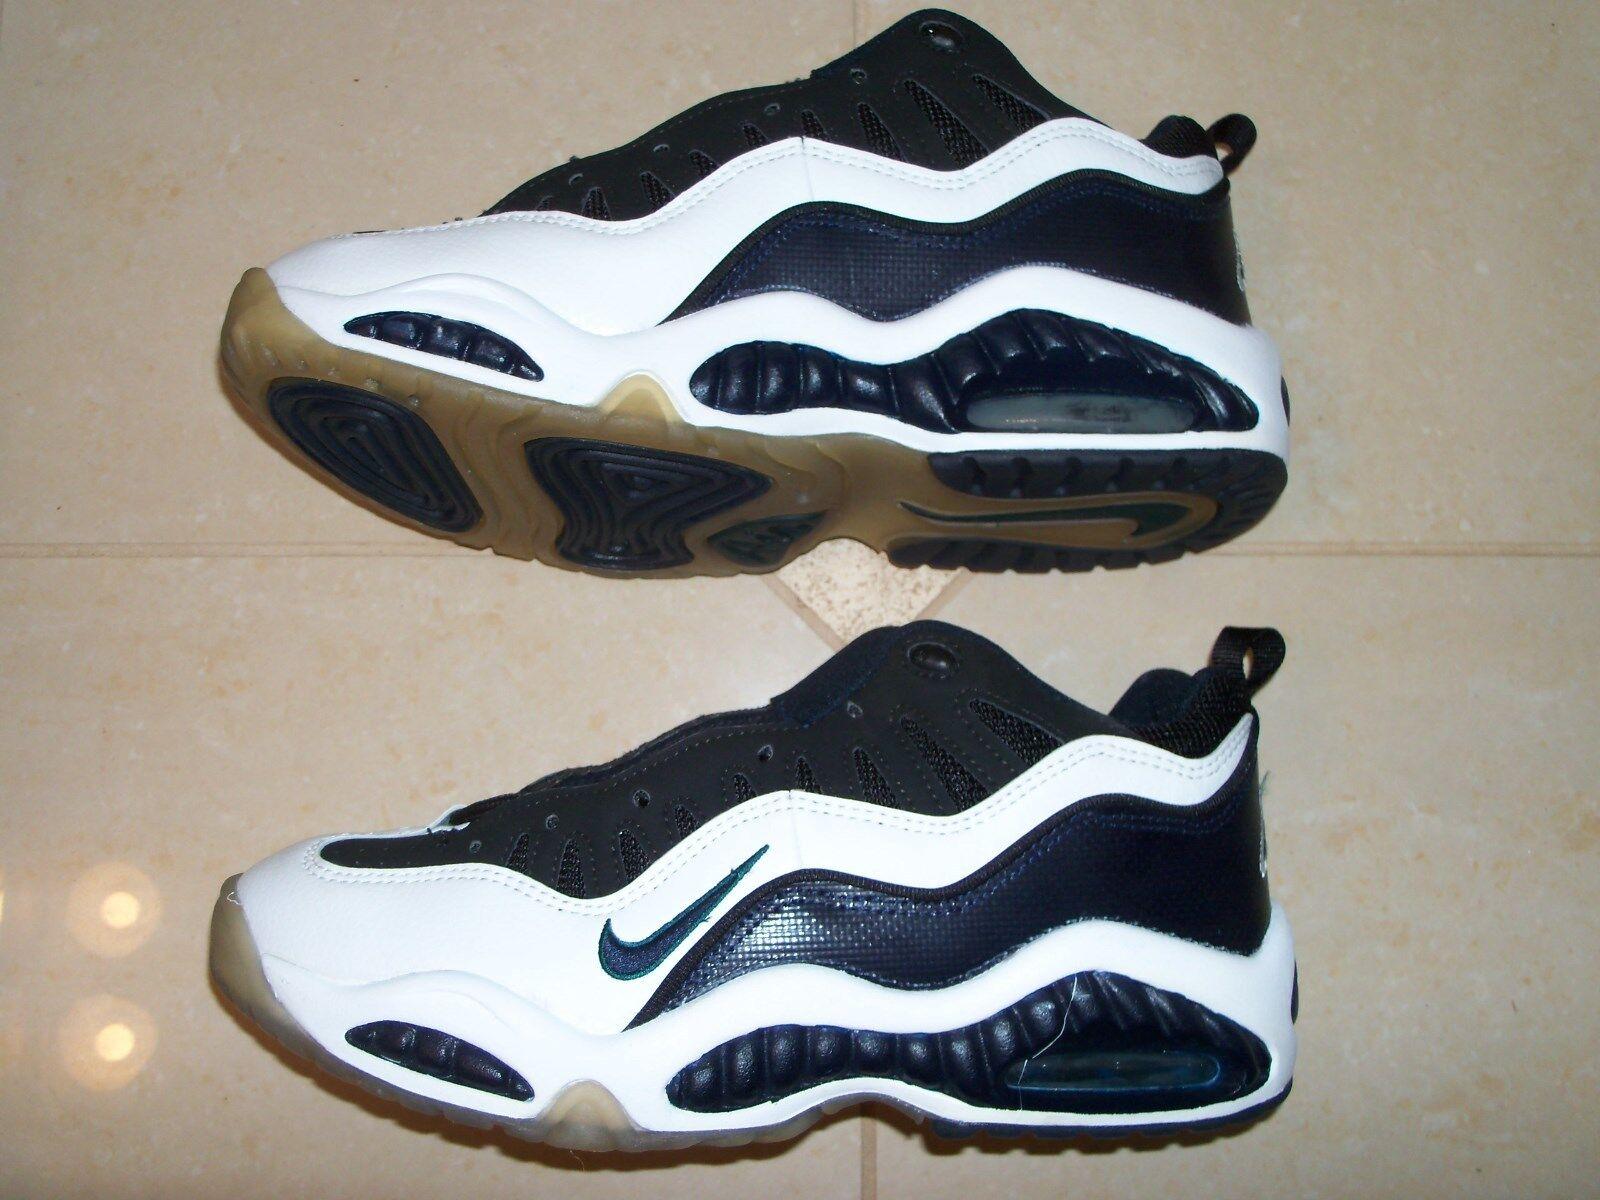 1996 og nike air so niedrige uptempo vintage - - - sneaker neue sz: 9,5 wht / blk / marine ffa14a